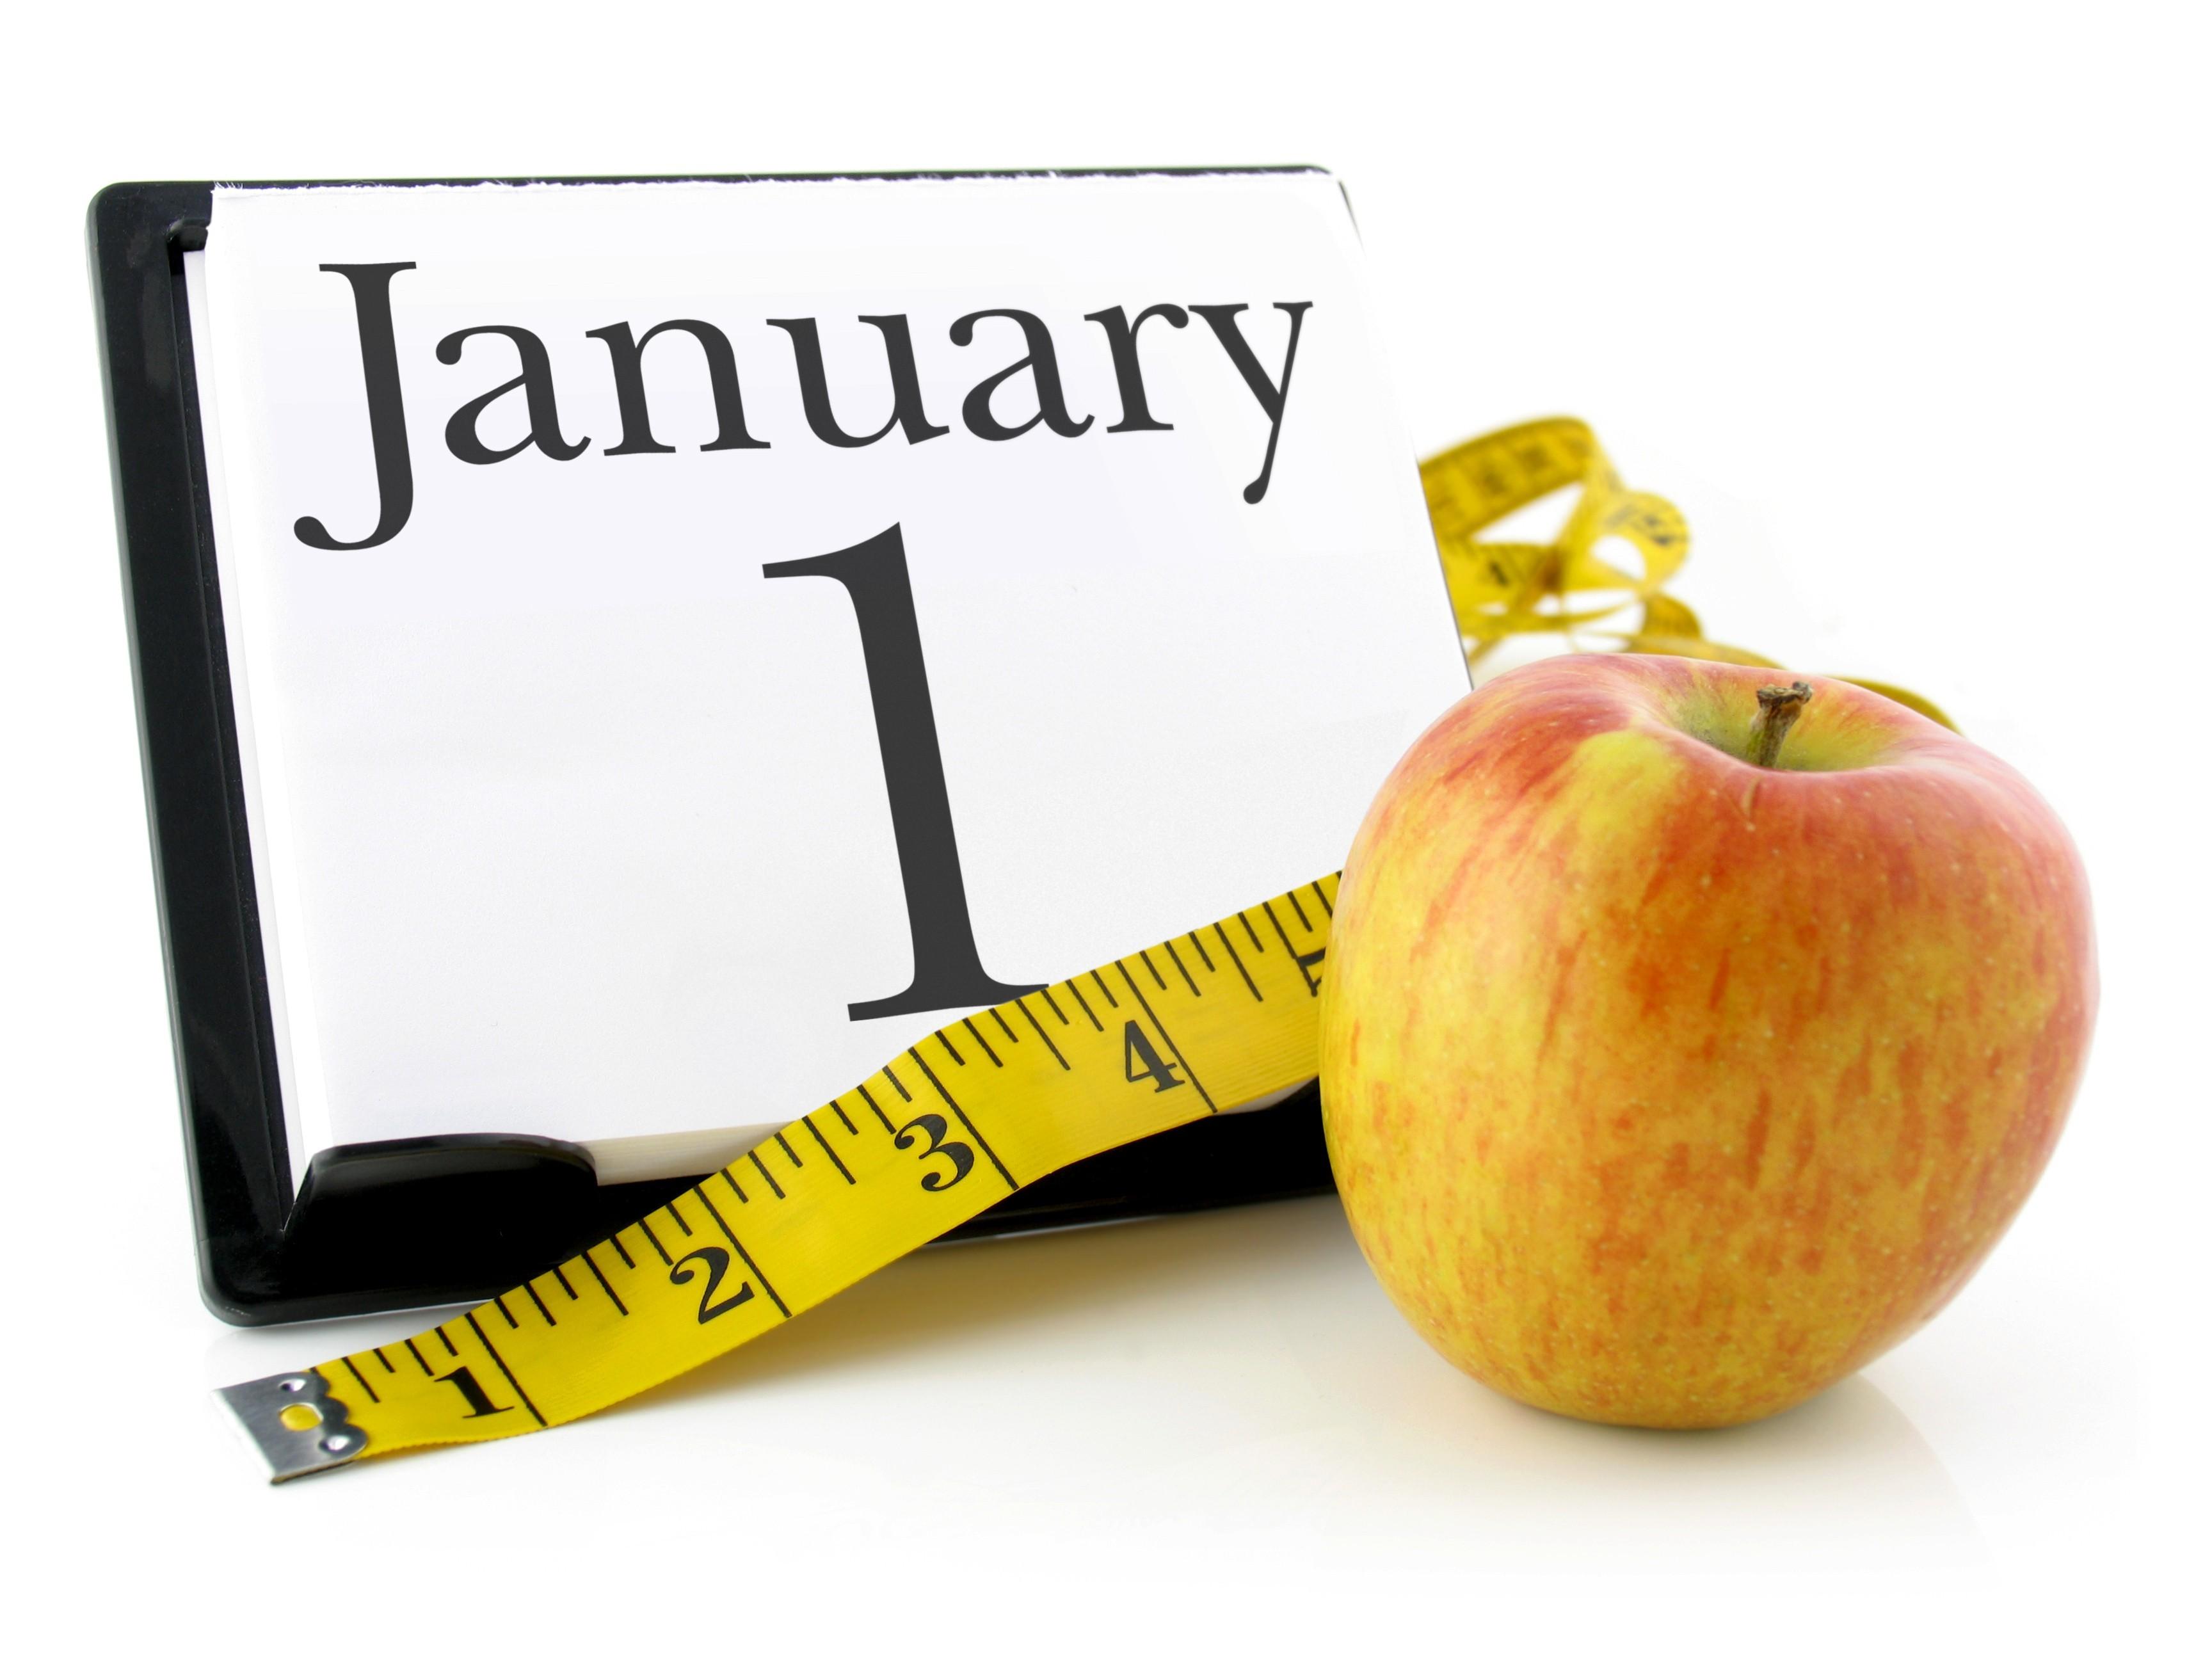 January health image